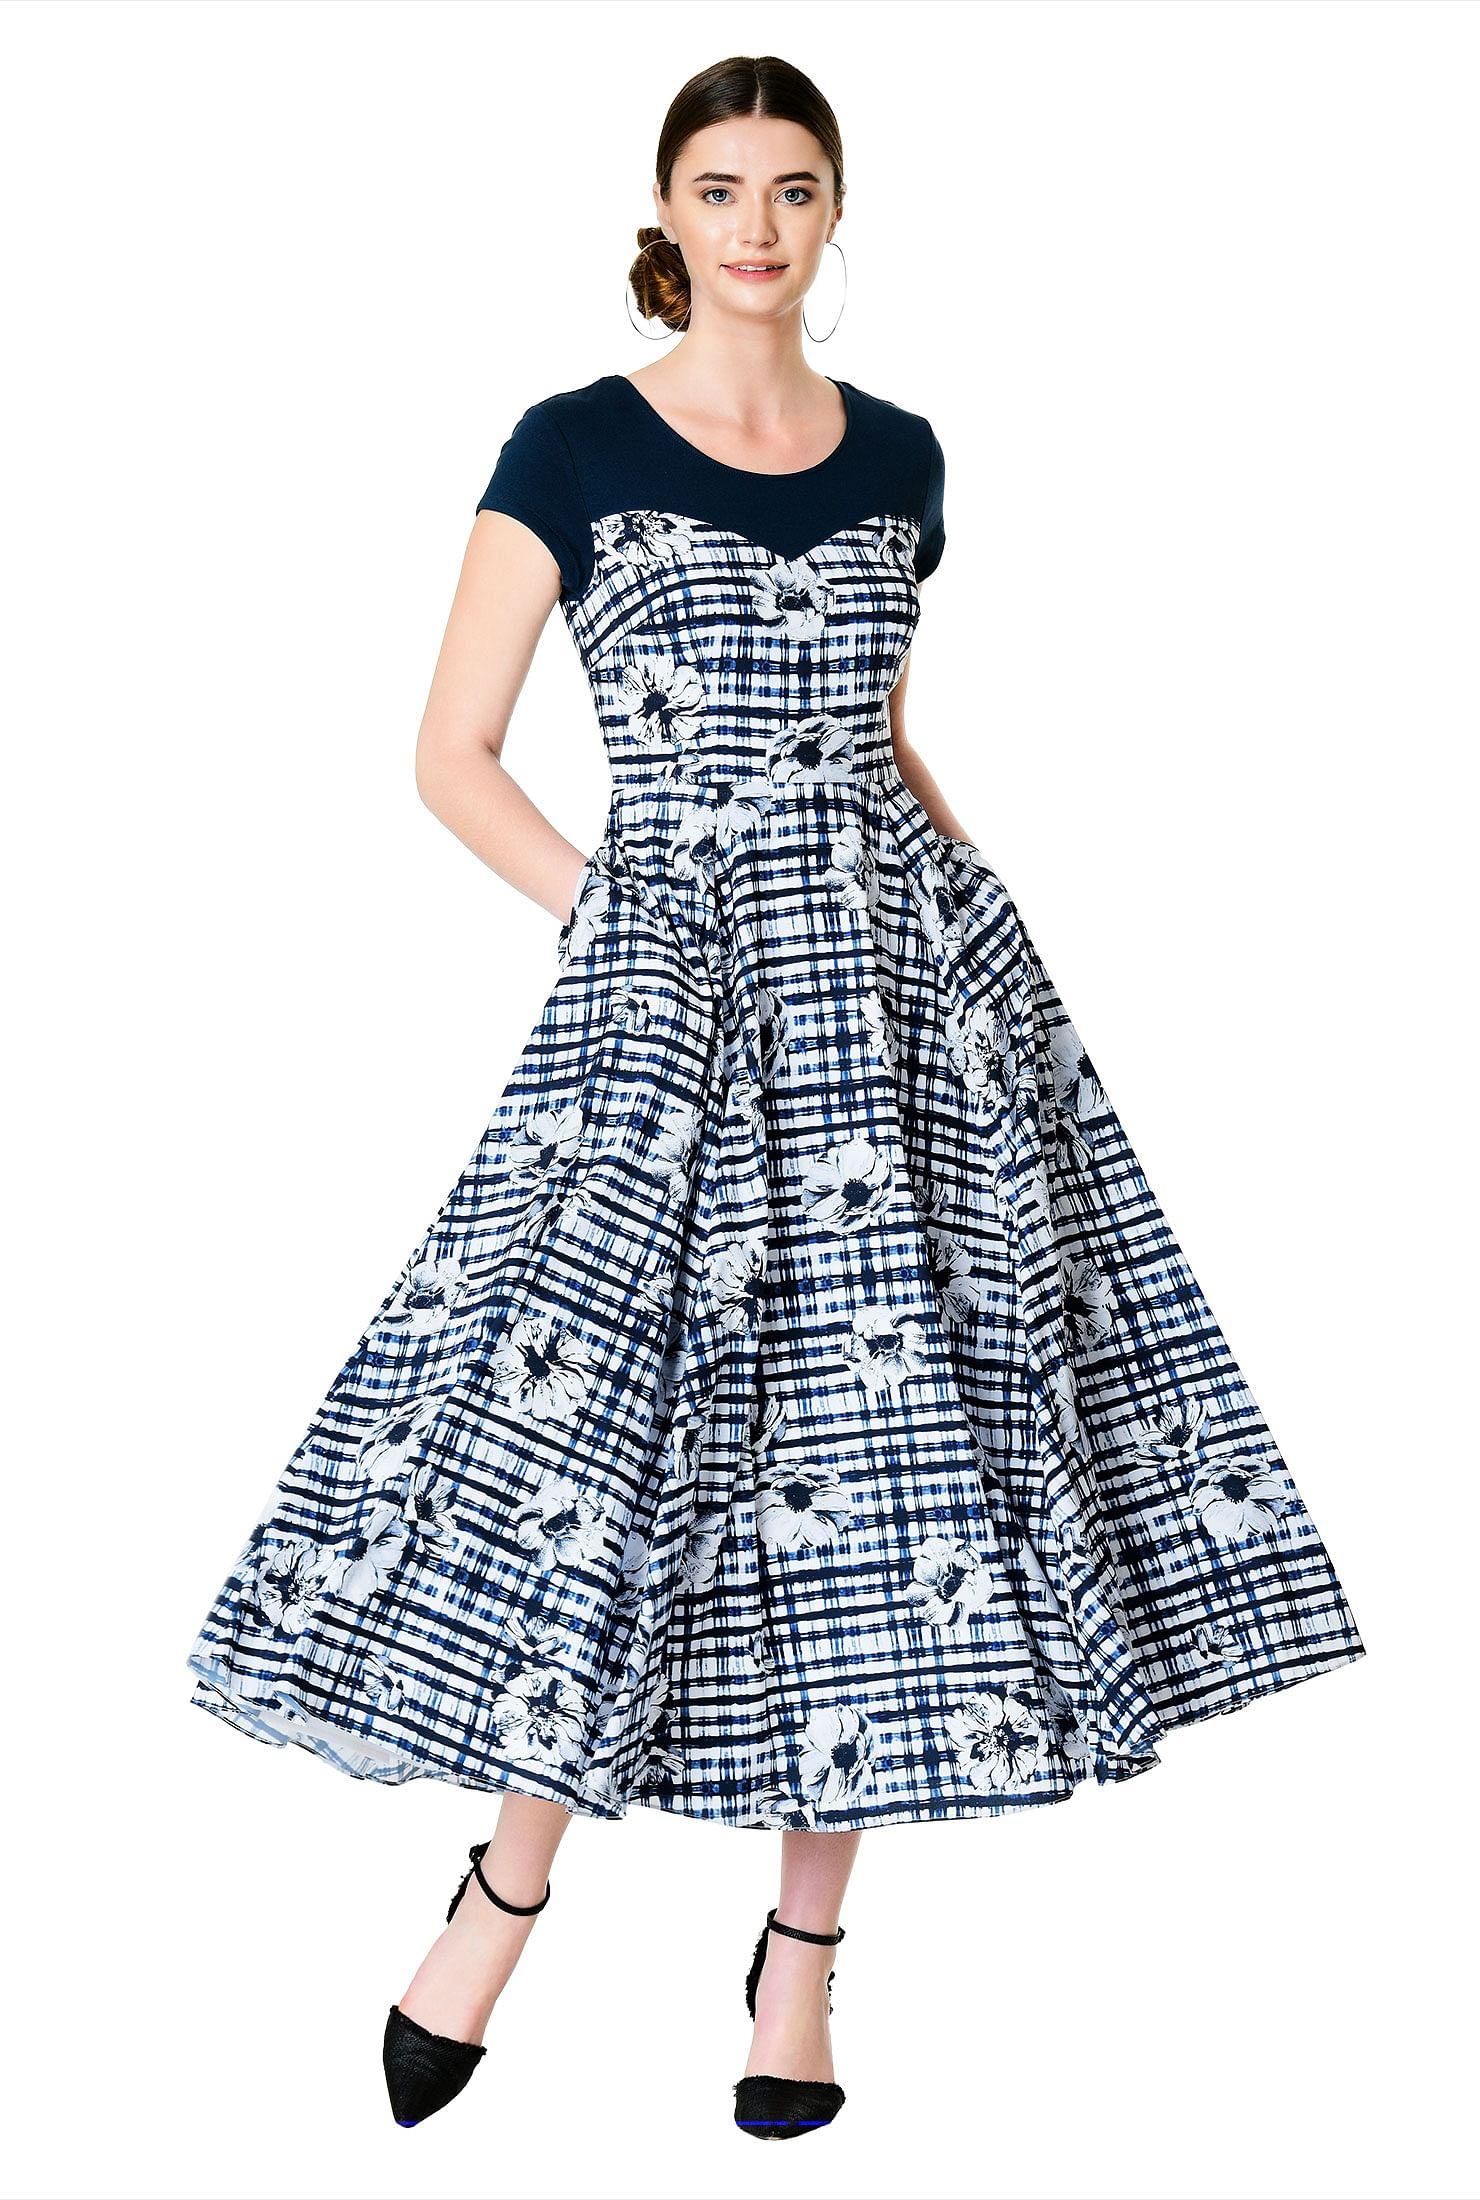 8fc70f076ac48 below the knee length dresses, black dresses, cap sleeve dresses, chic  dresses